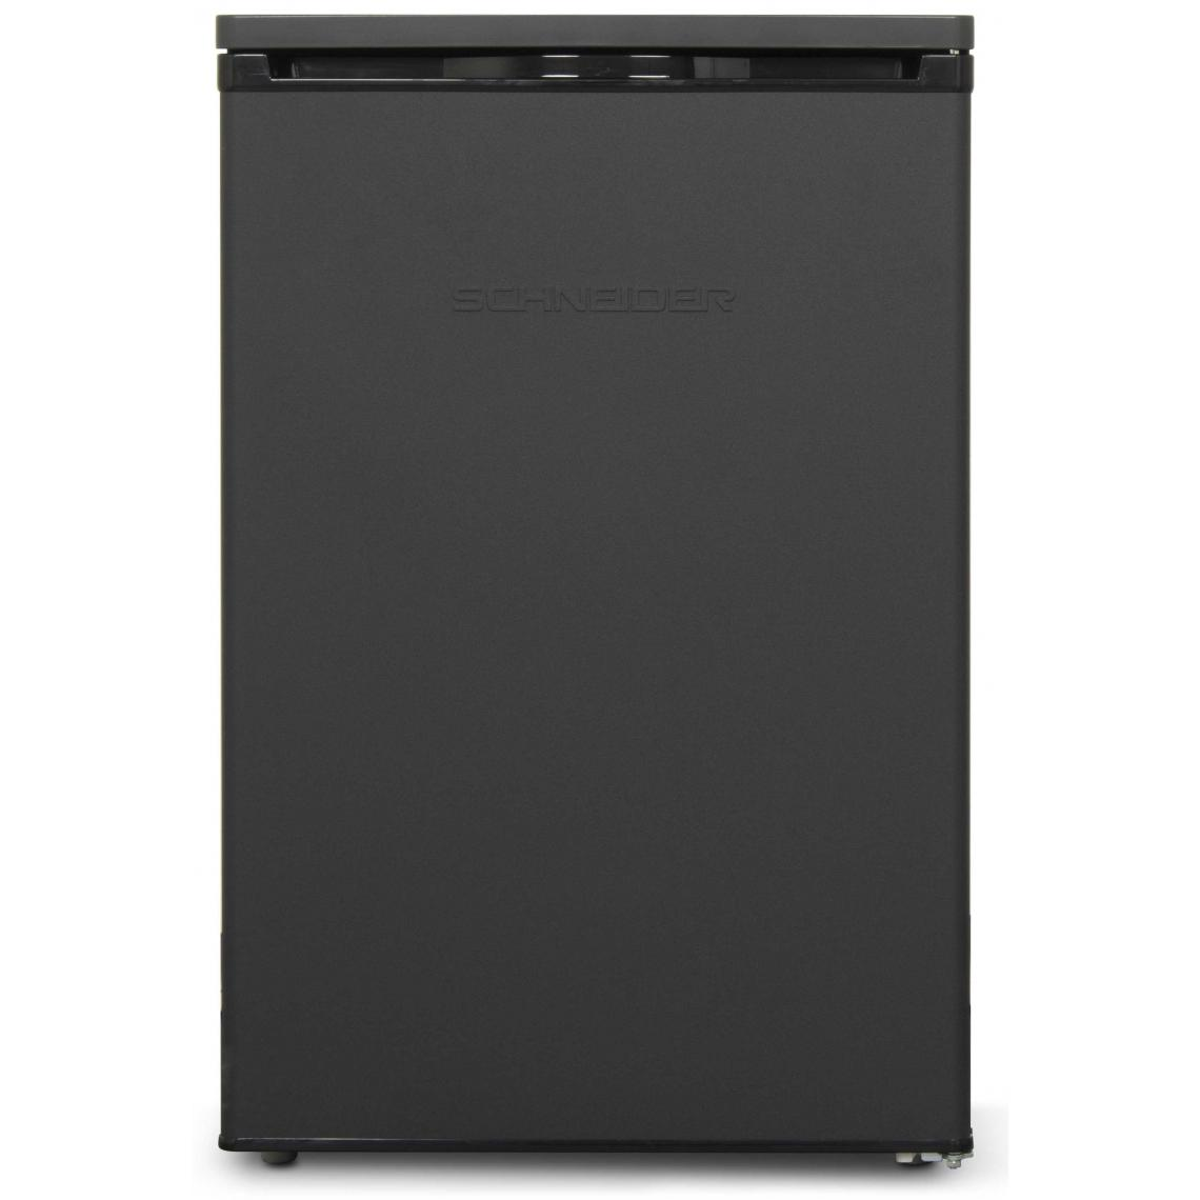 Schneider Réfrigérateur table top SCHNEIDER STTL112B